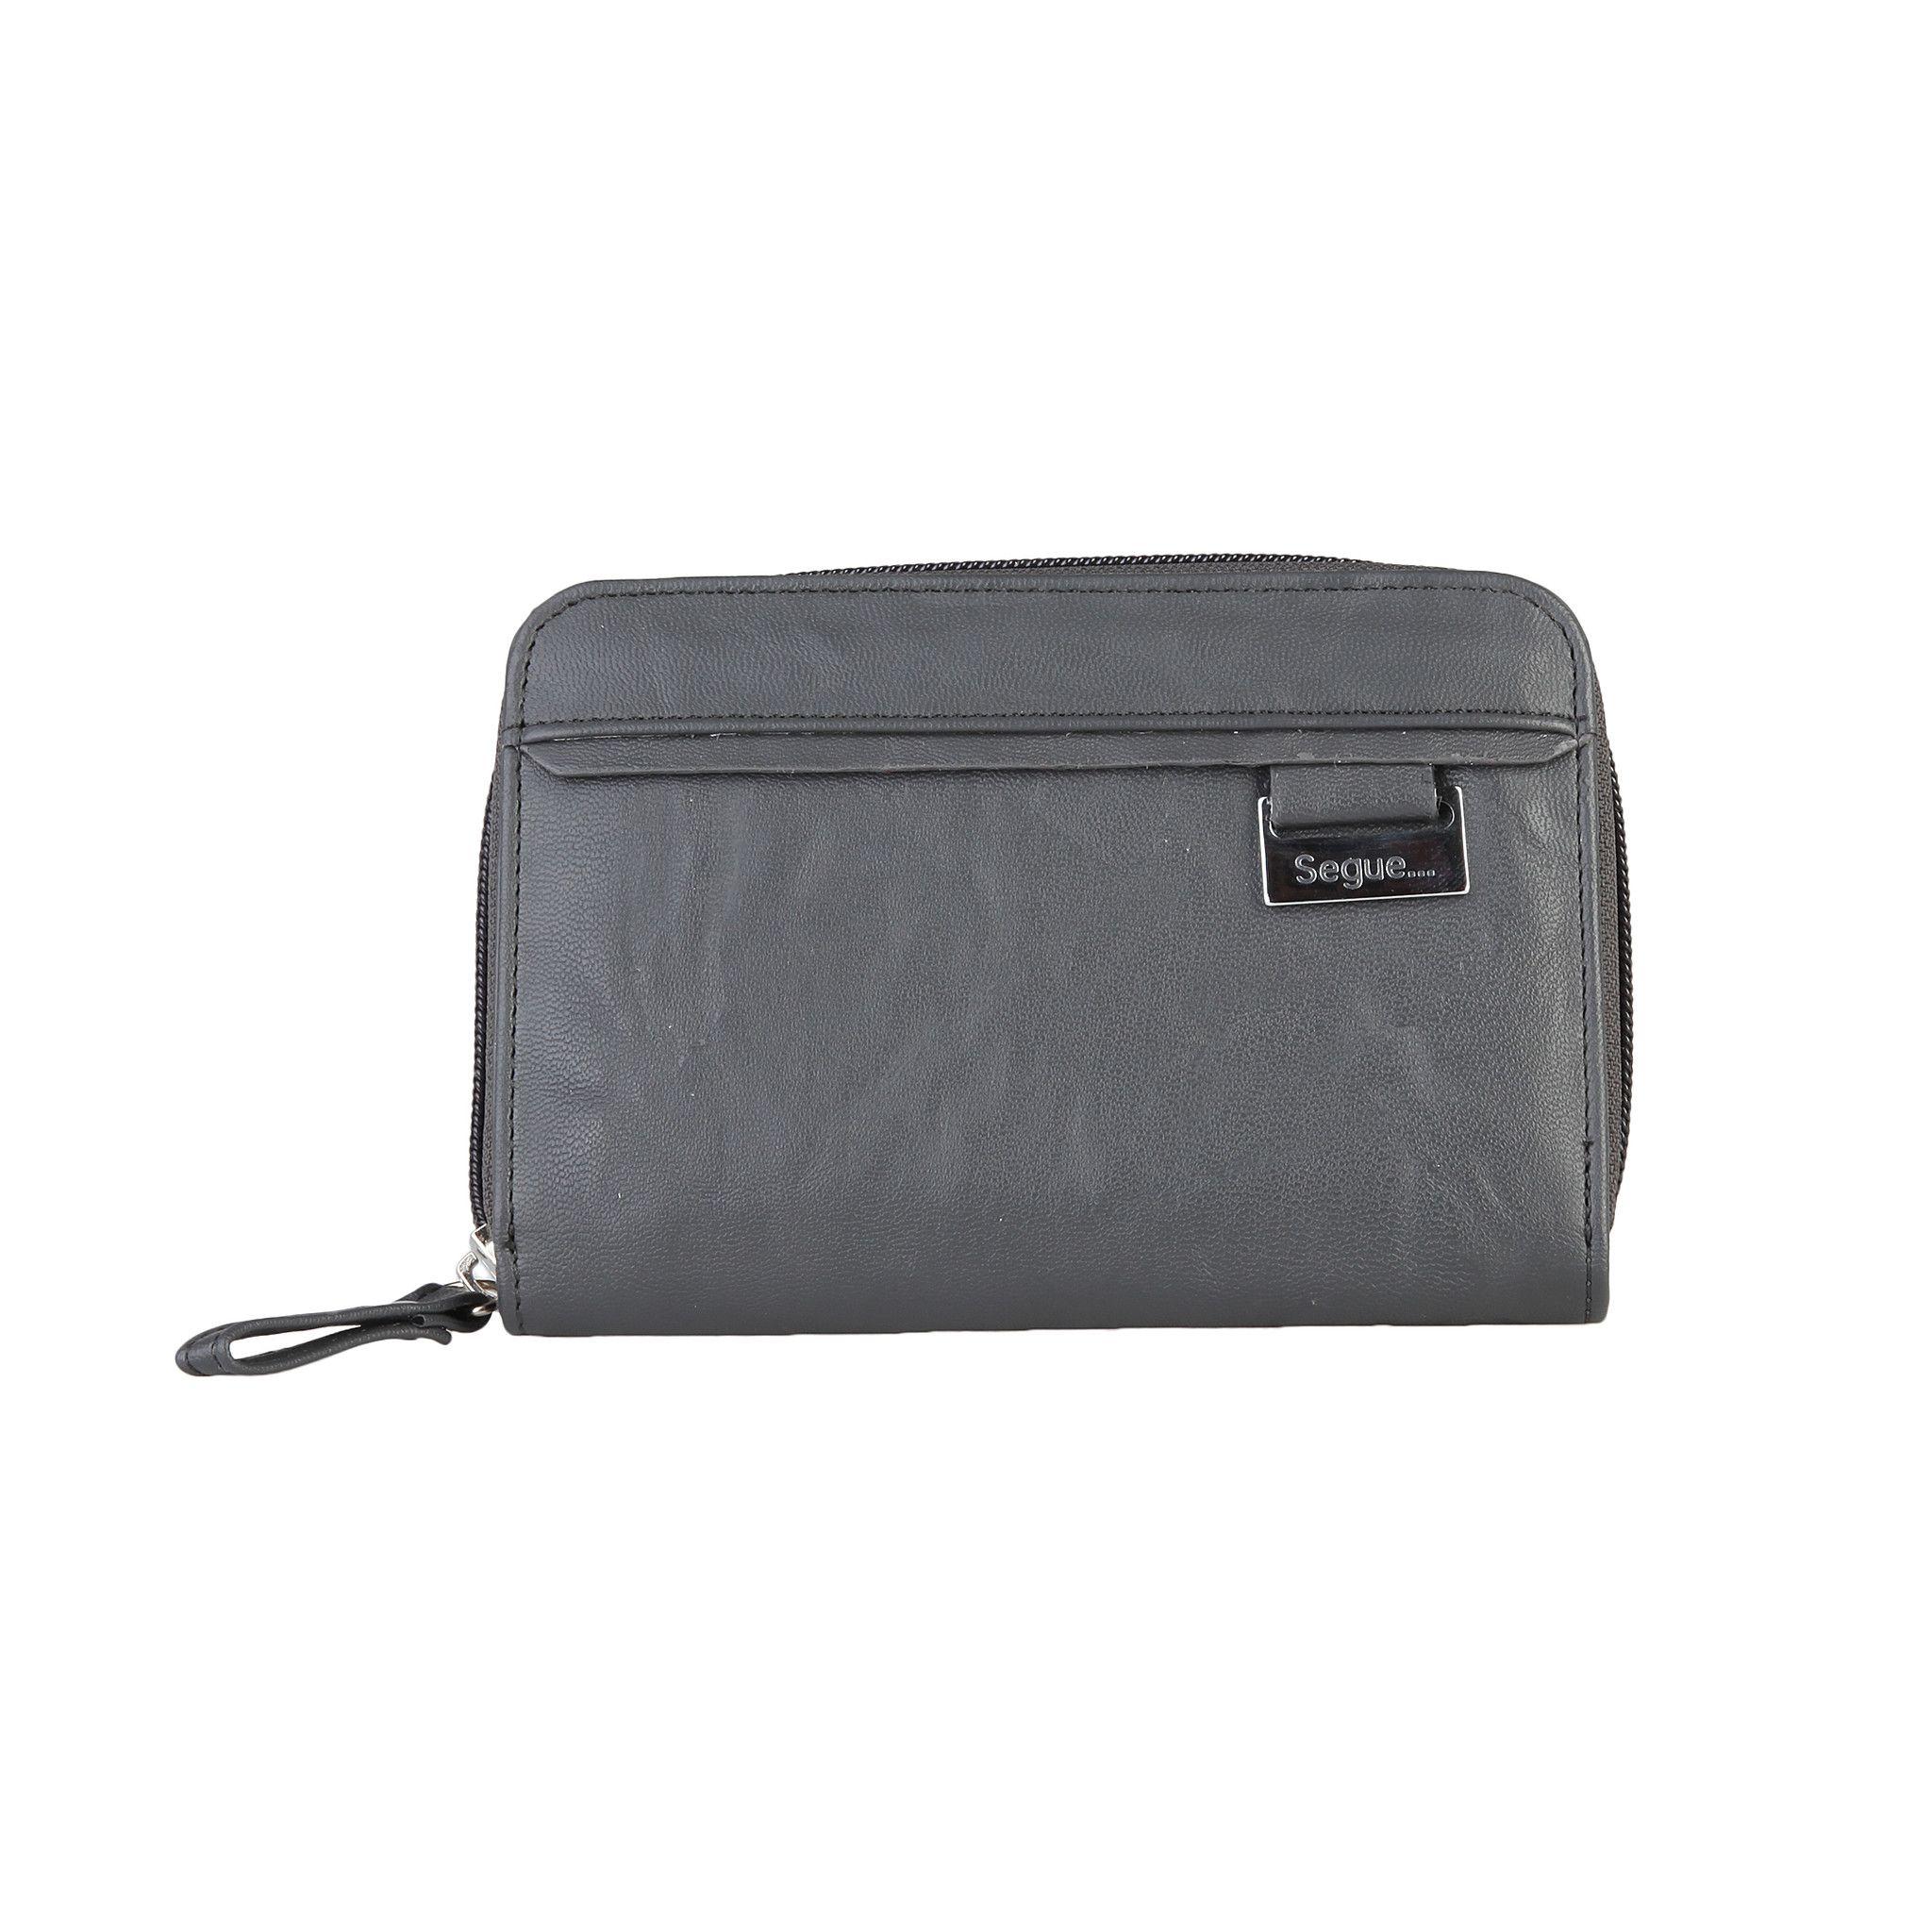 Segue Bags On Sale #clothing #fashion #women #Bags #Handbags